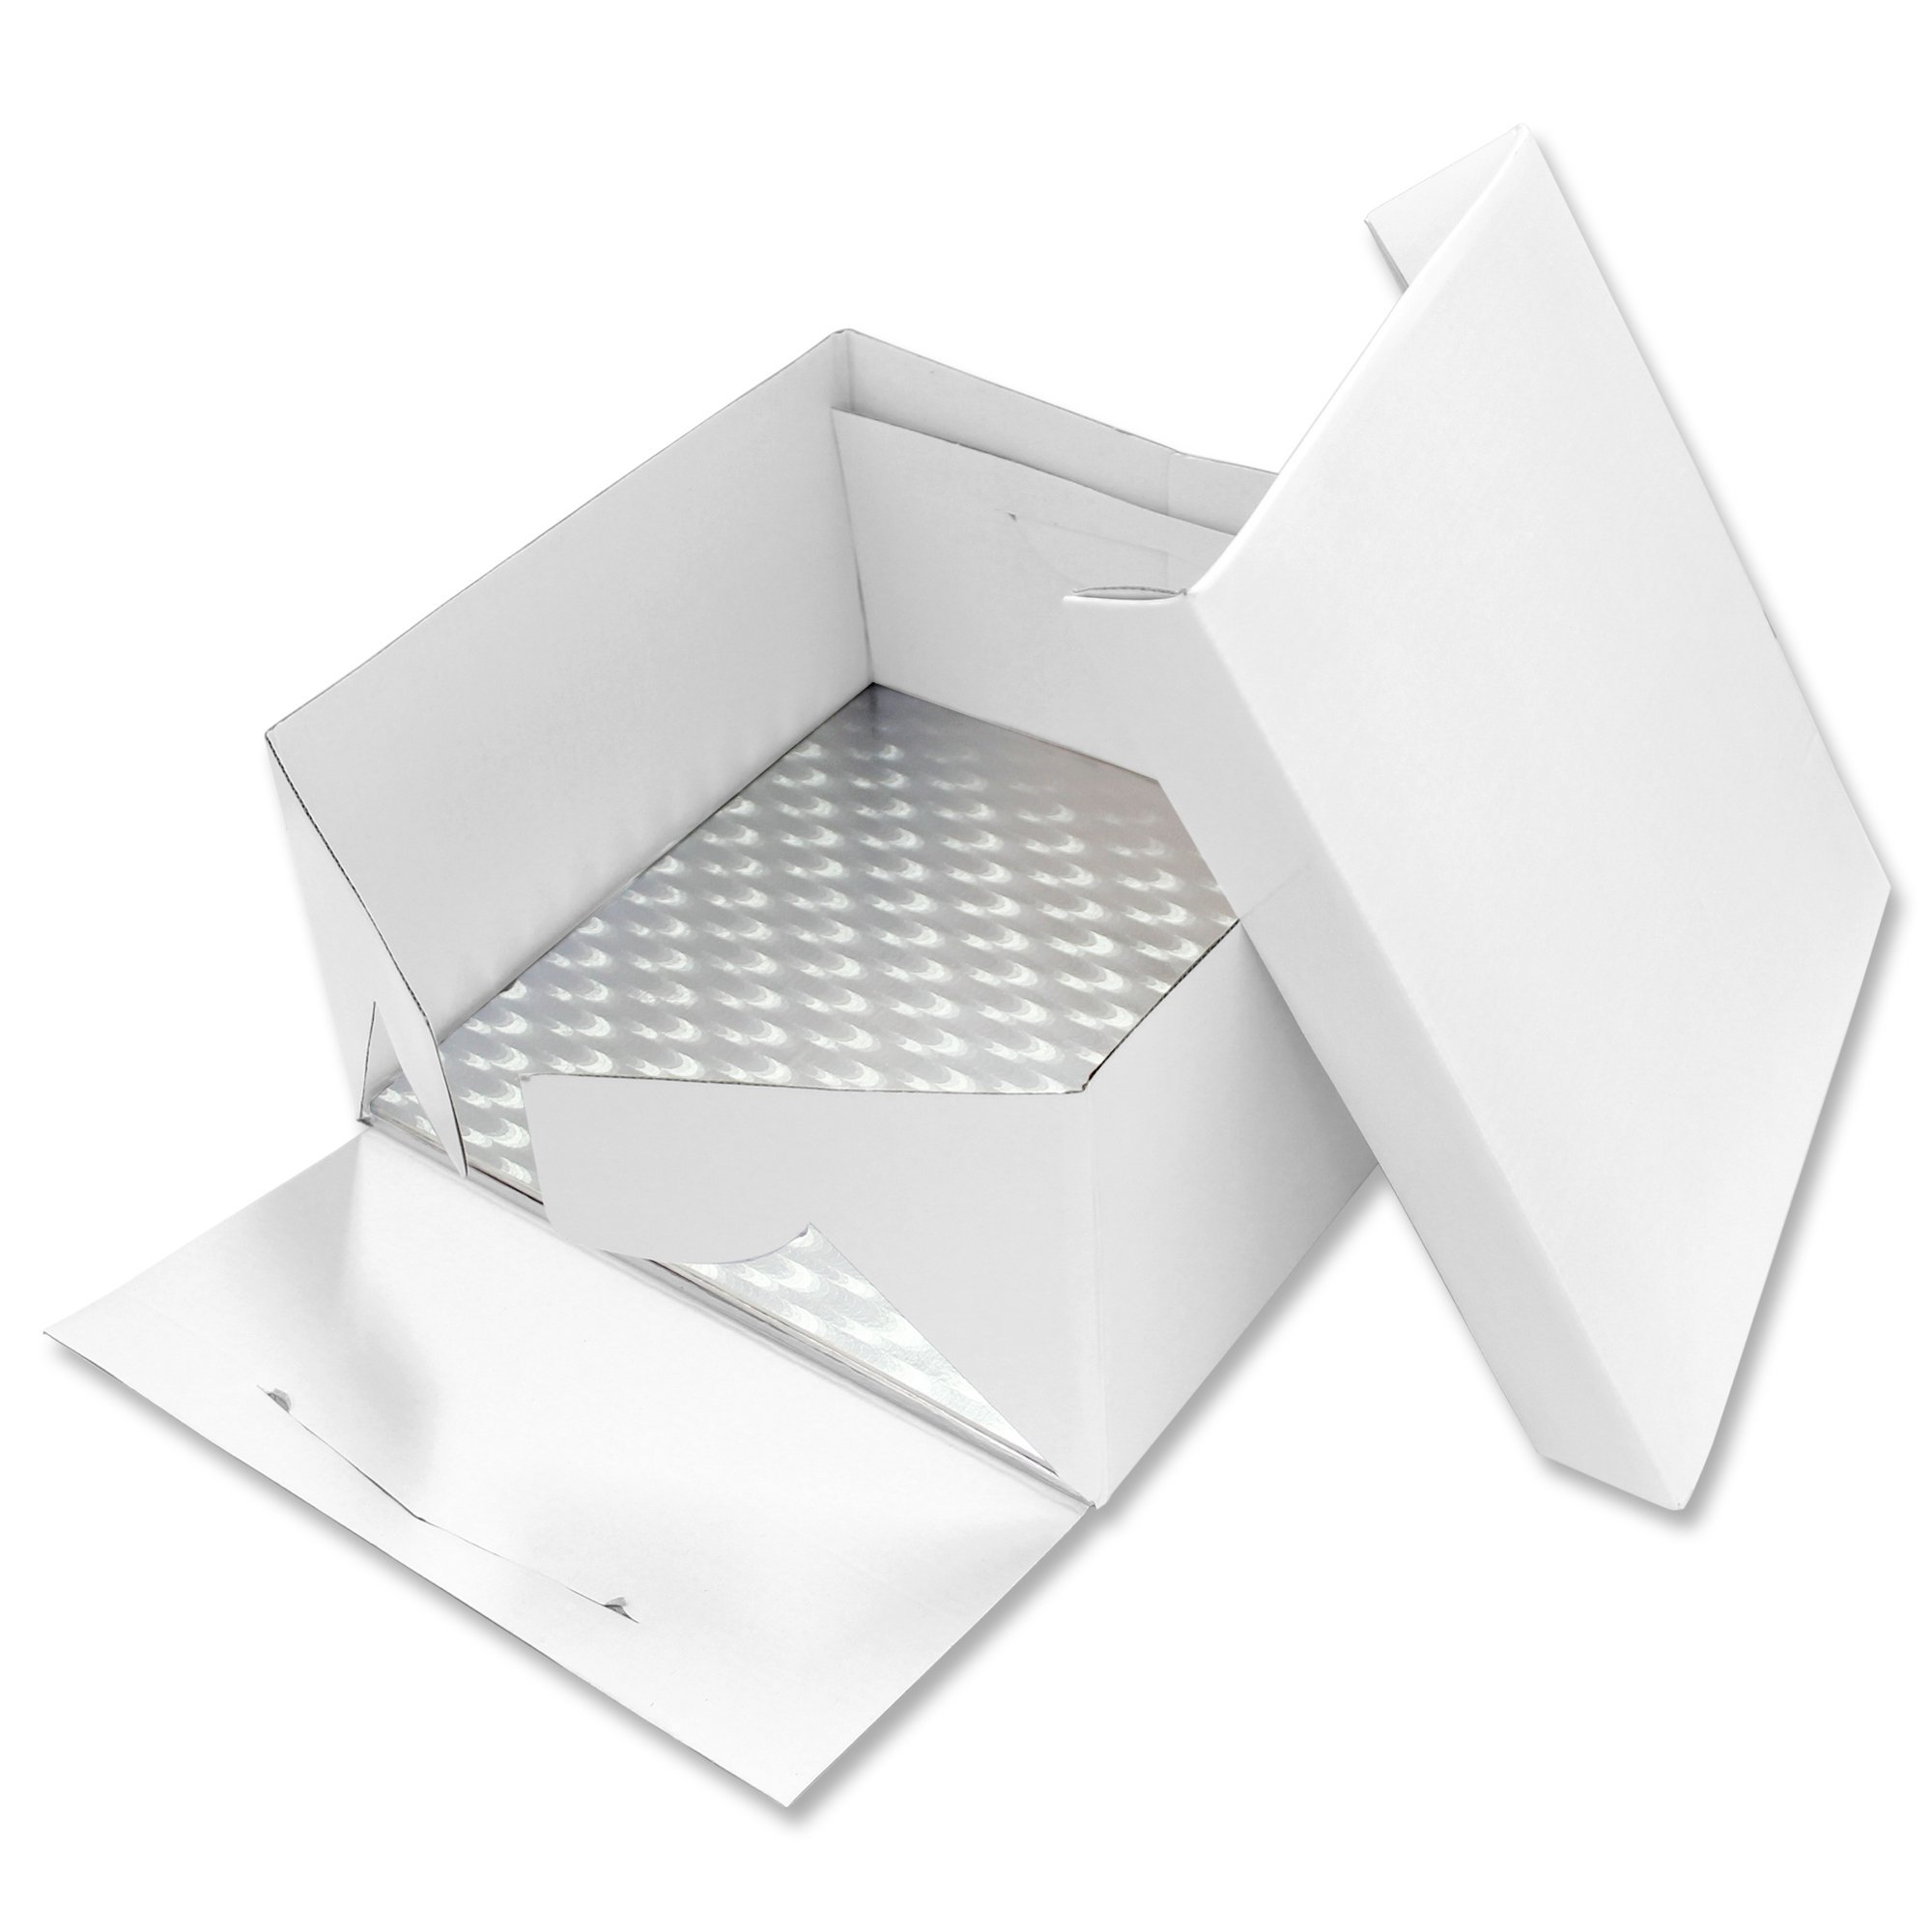 PME Tarjeta de Pastel Alargada y Caja para Pastel 13 x 9 Pulgadas 33 x 23 cm